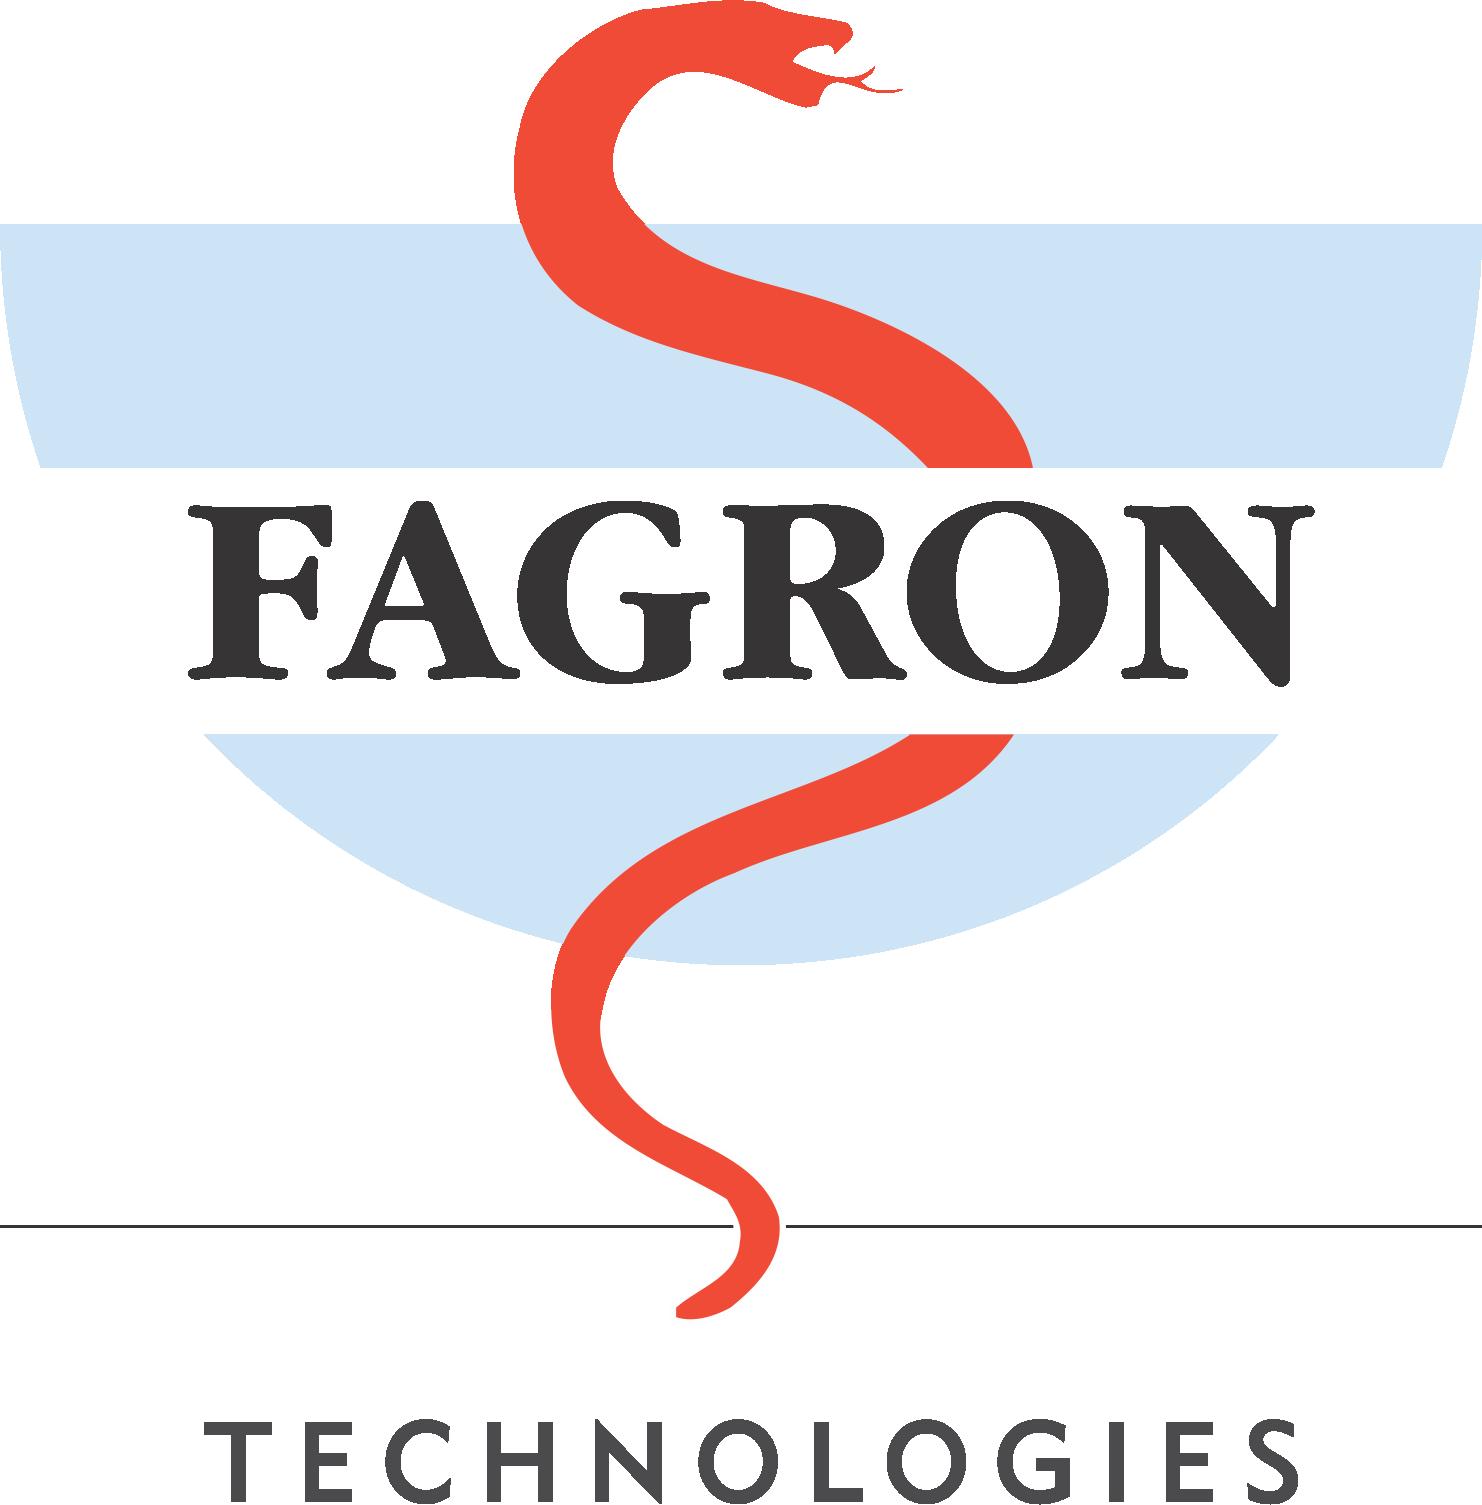 Fagron Technologies